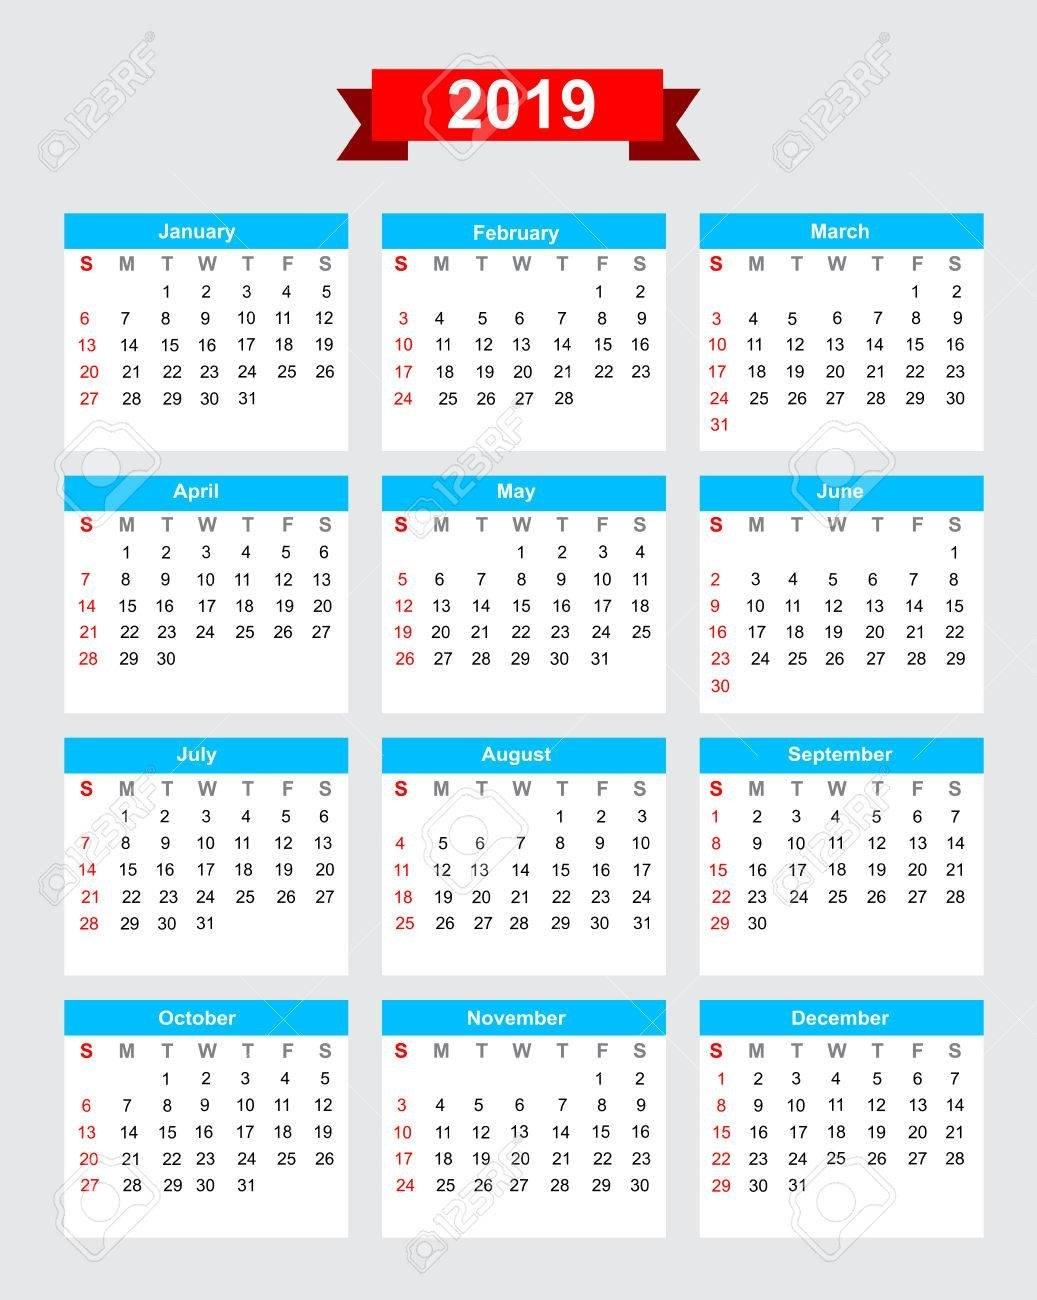 2019 Calendar Week Start Sunday Vector Royalty Free Cliparts Calendar 2019 In Weeks